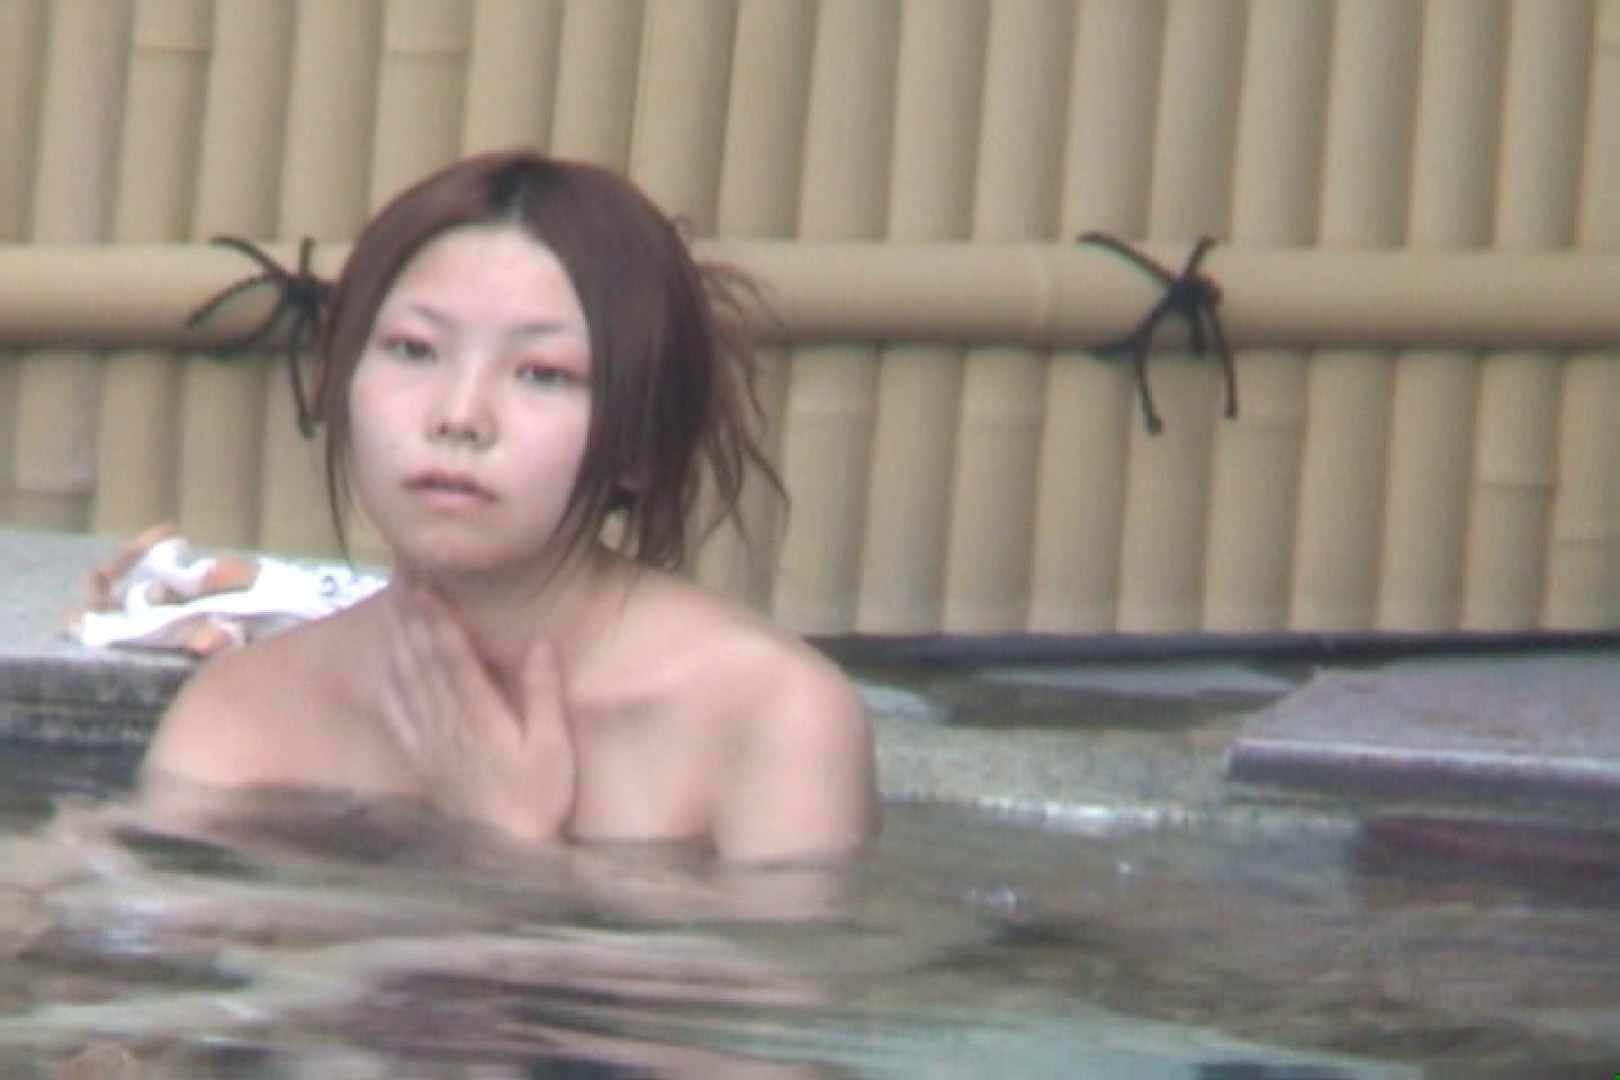 Aquaな露天風呂Vol.570 盗撮 のぞき動画画像 71枚 68